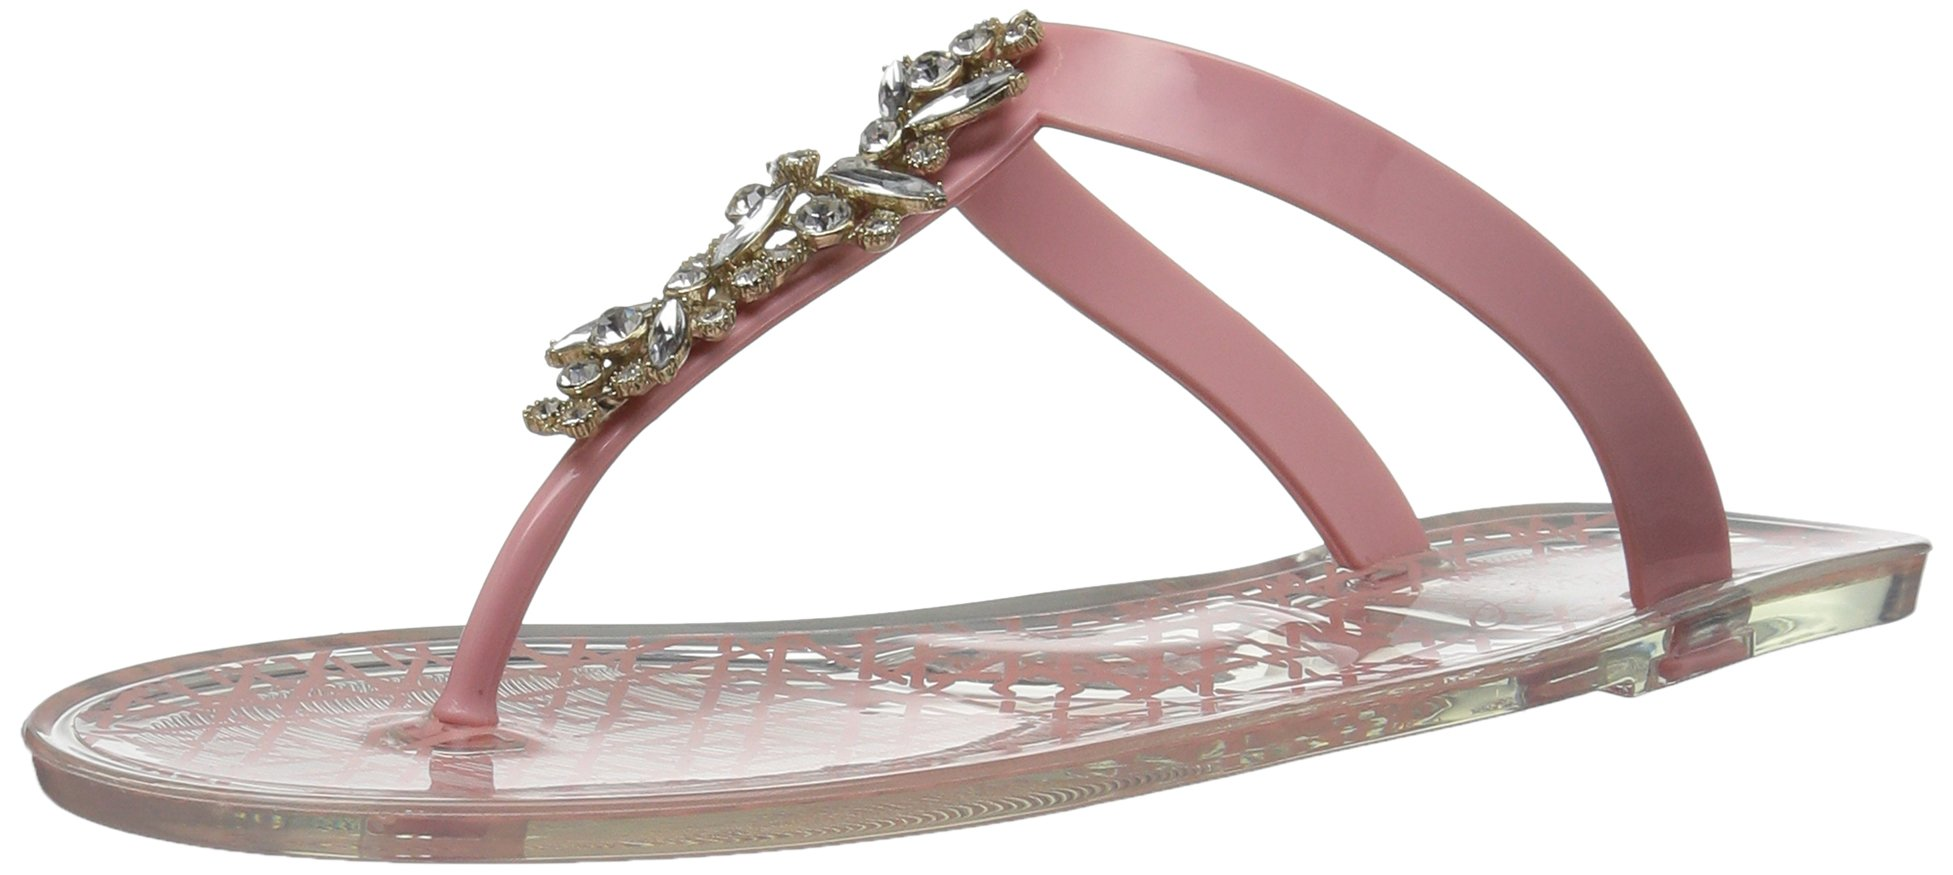 Badgley Mischka Jewel Women's Gracia Flat Sandal, Pale Pink, 10 Medium US by Badgley Mischka